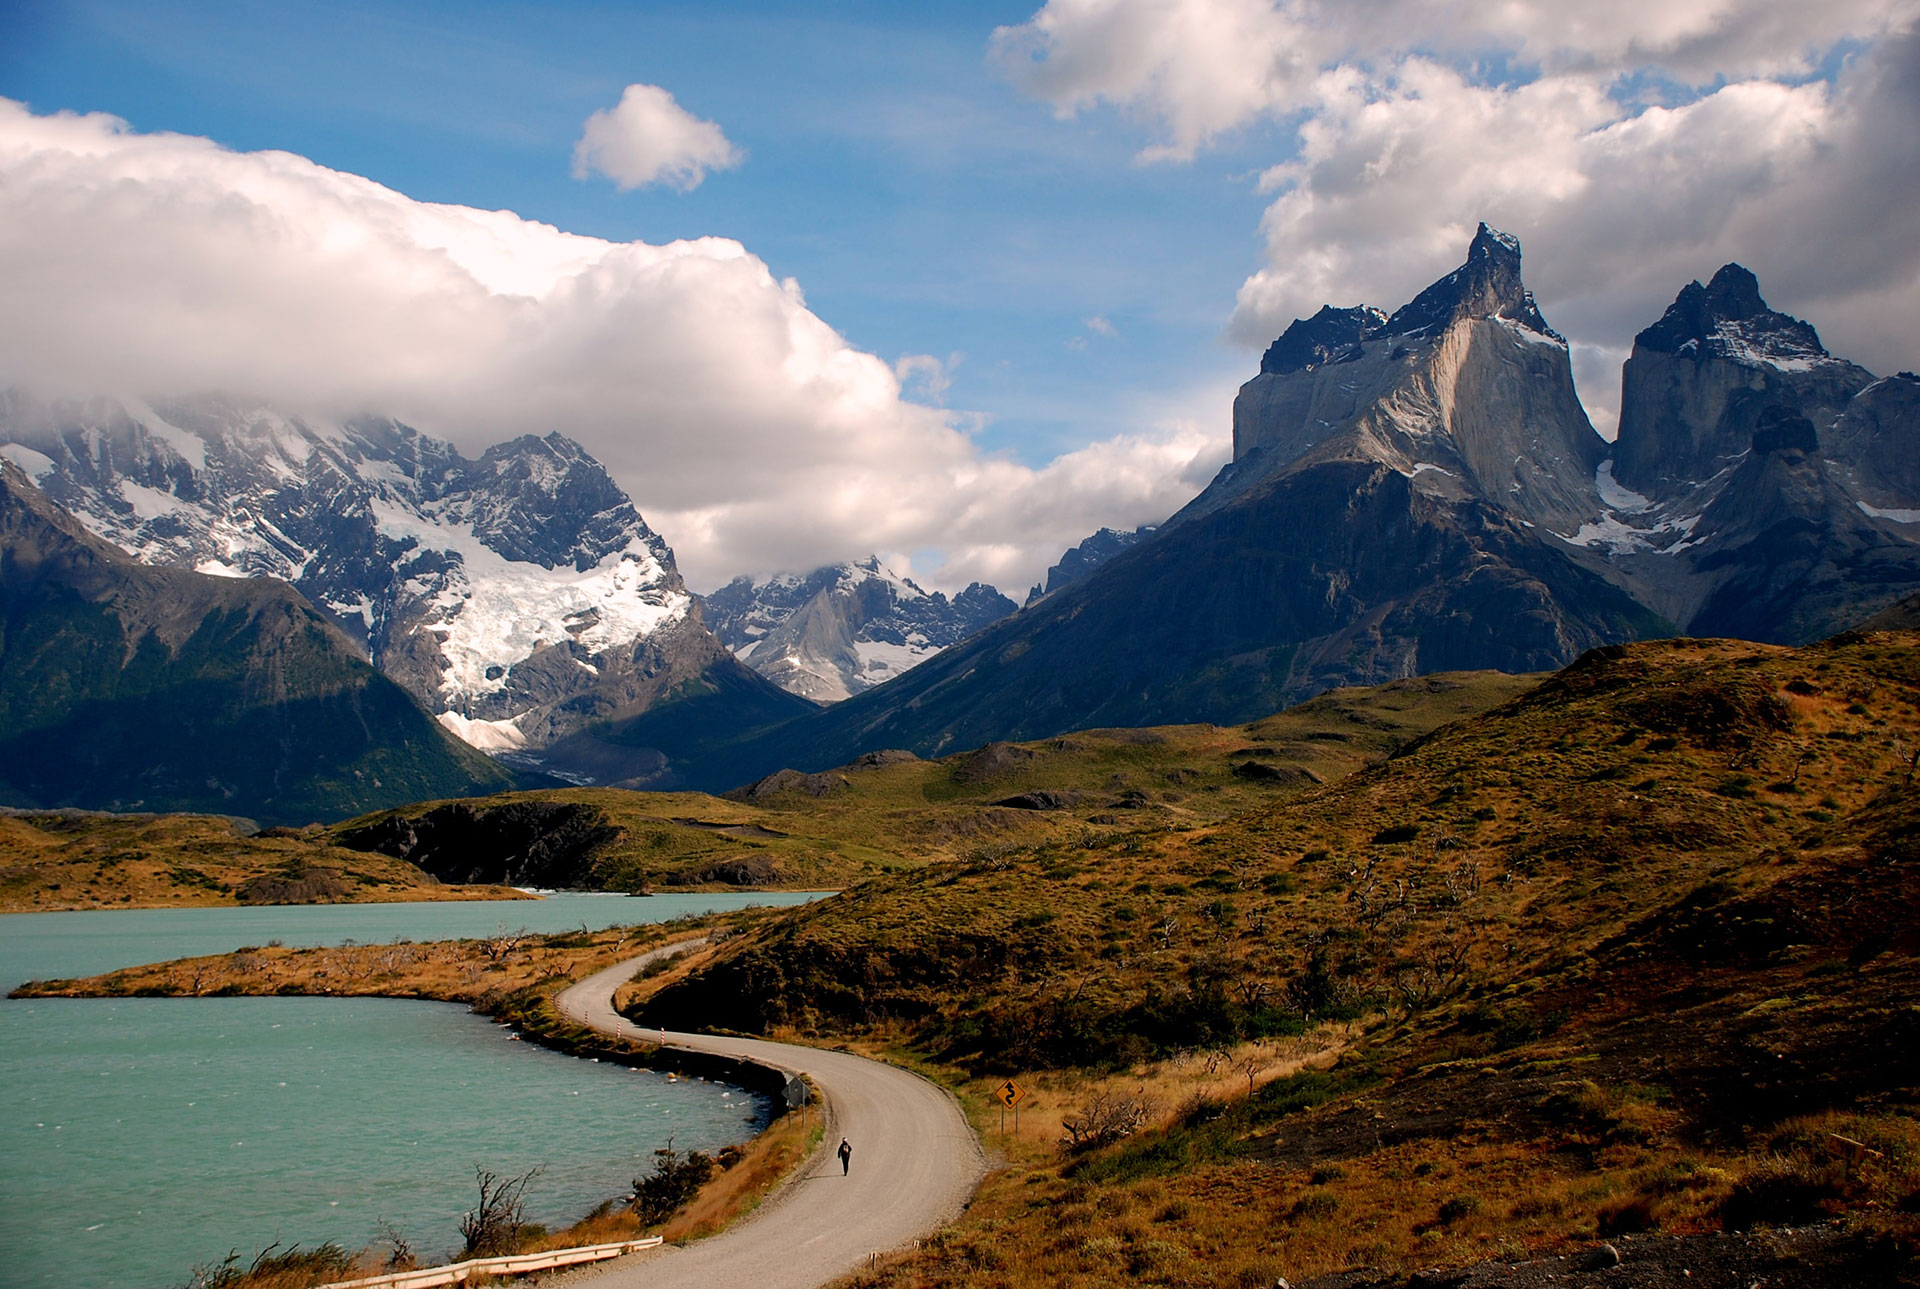 Exploring-the-mountains_Unsplash